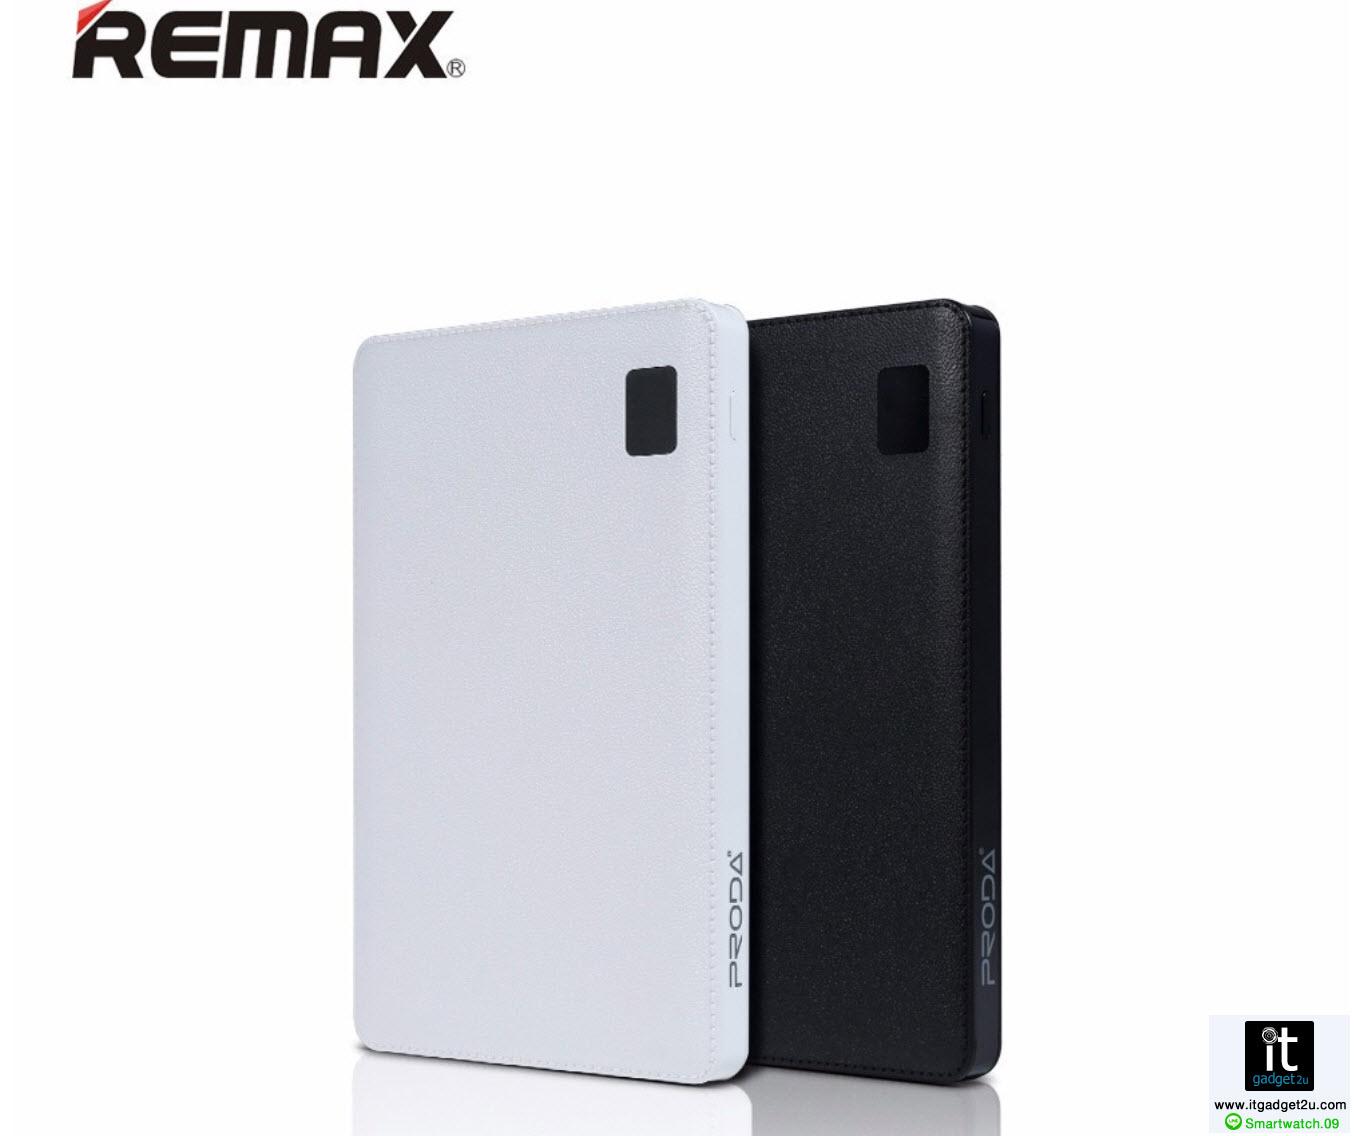 Power Bank แบตสำรอง รุ่น Proda Note Book 30000 mAh สีดำ ของแท้ ปกติราคา 1,890 ลดเหลือ 879 บาท